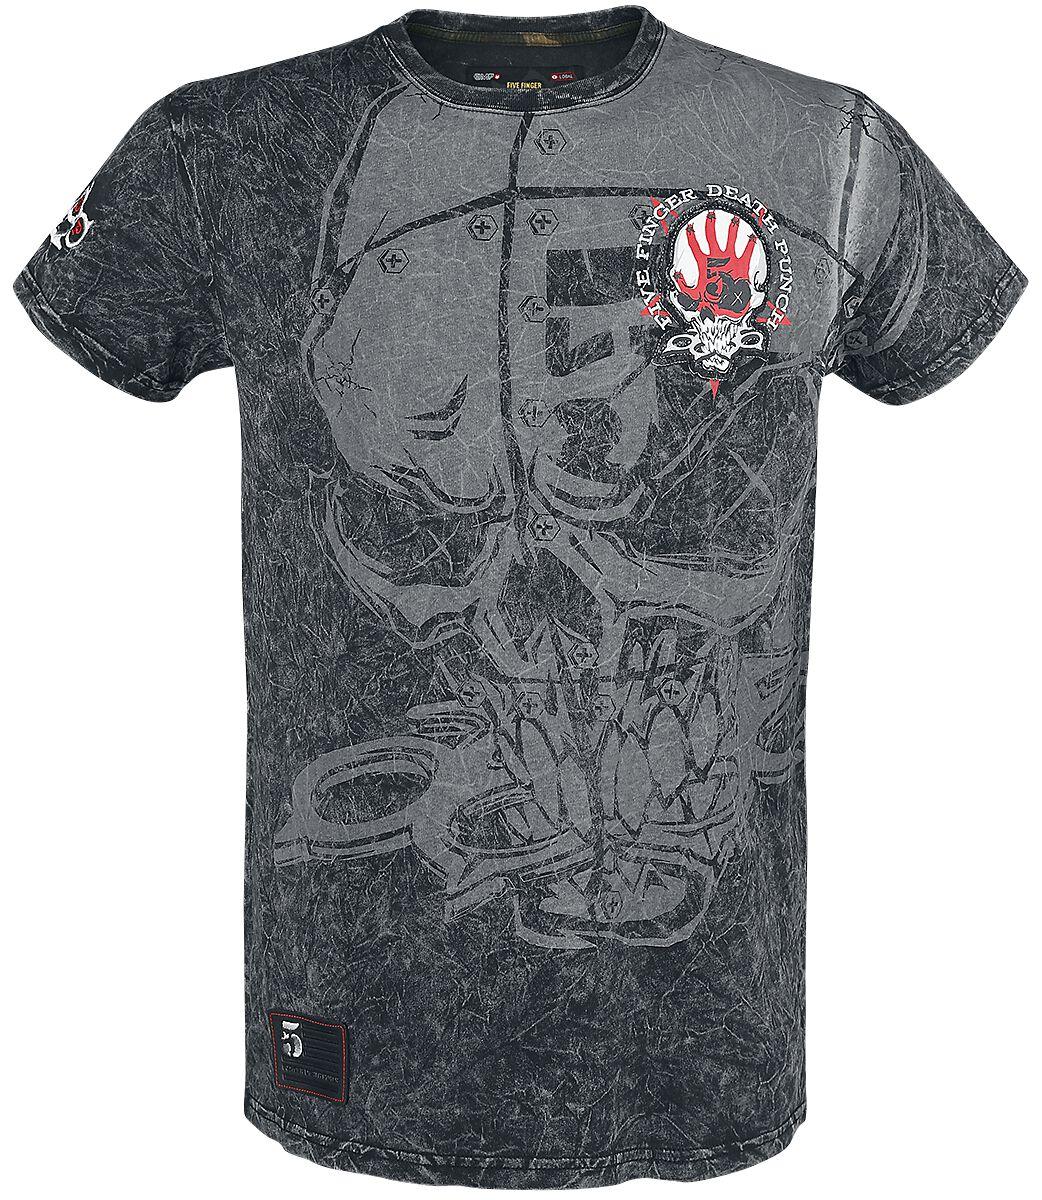 Image of   Five Finger Death Punch EMP Signature Collection T-Shirt mørk grå